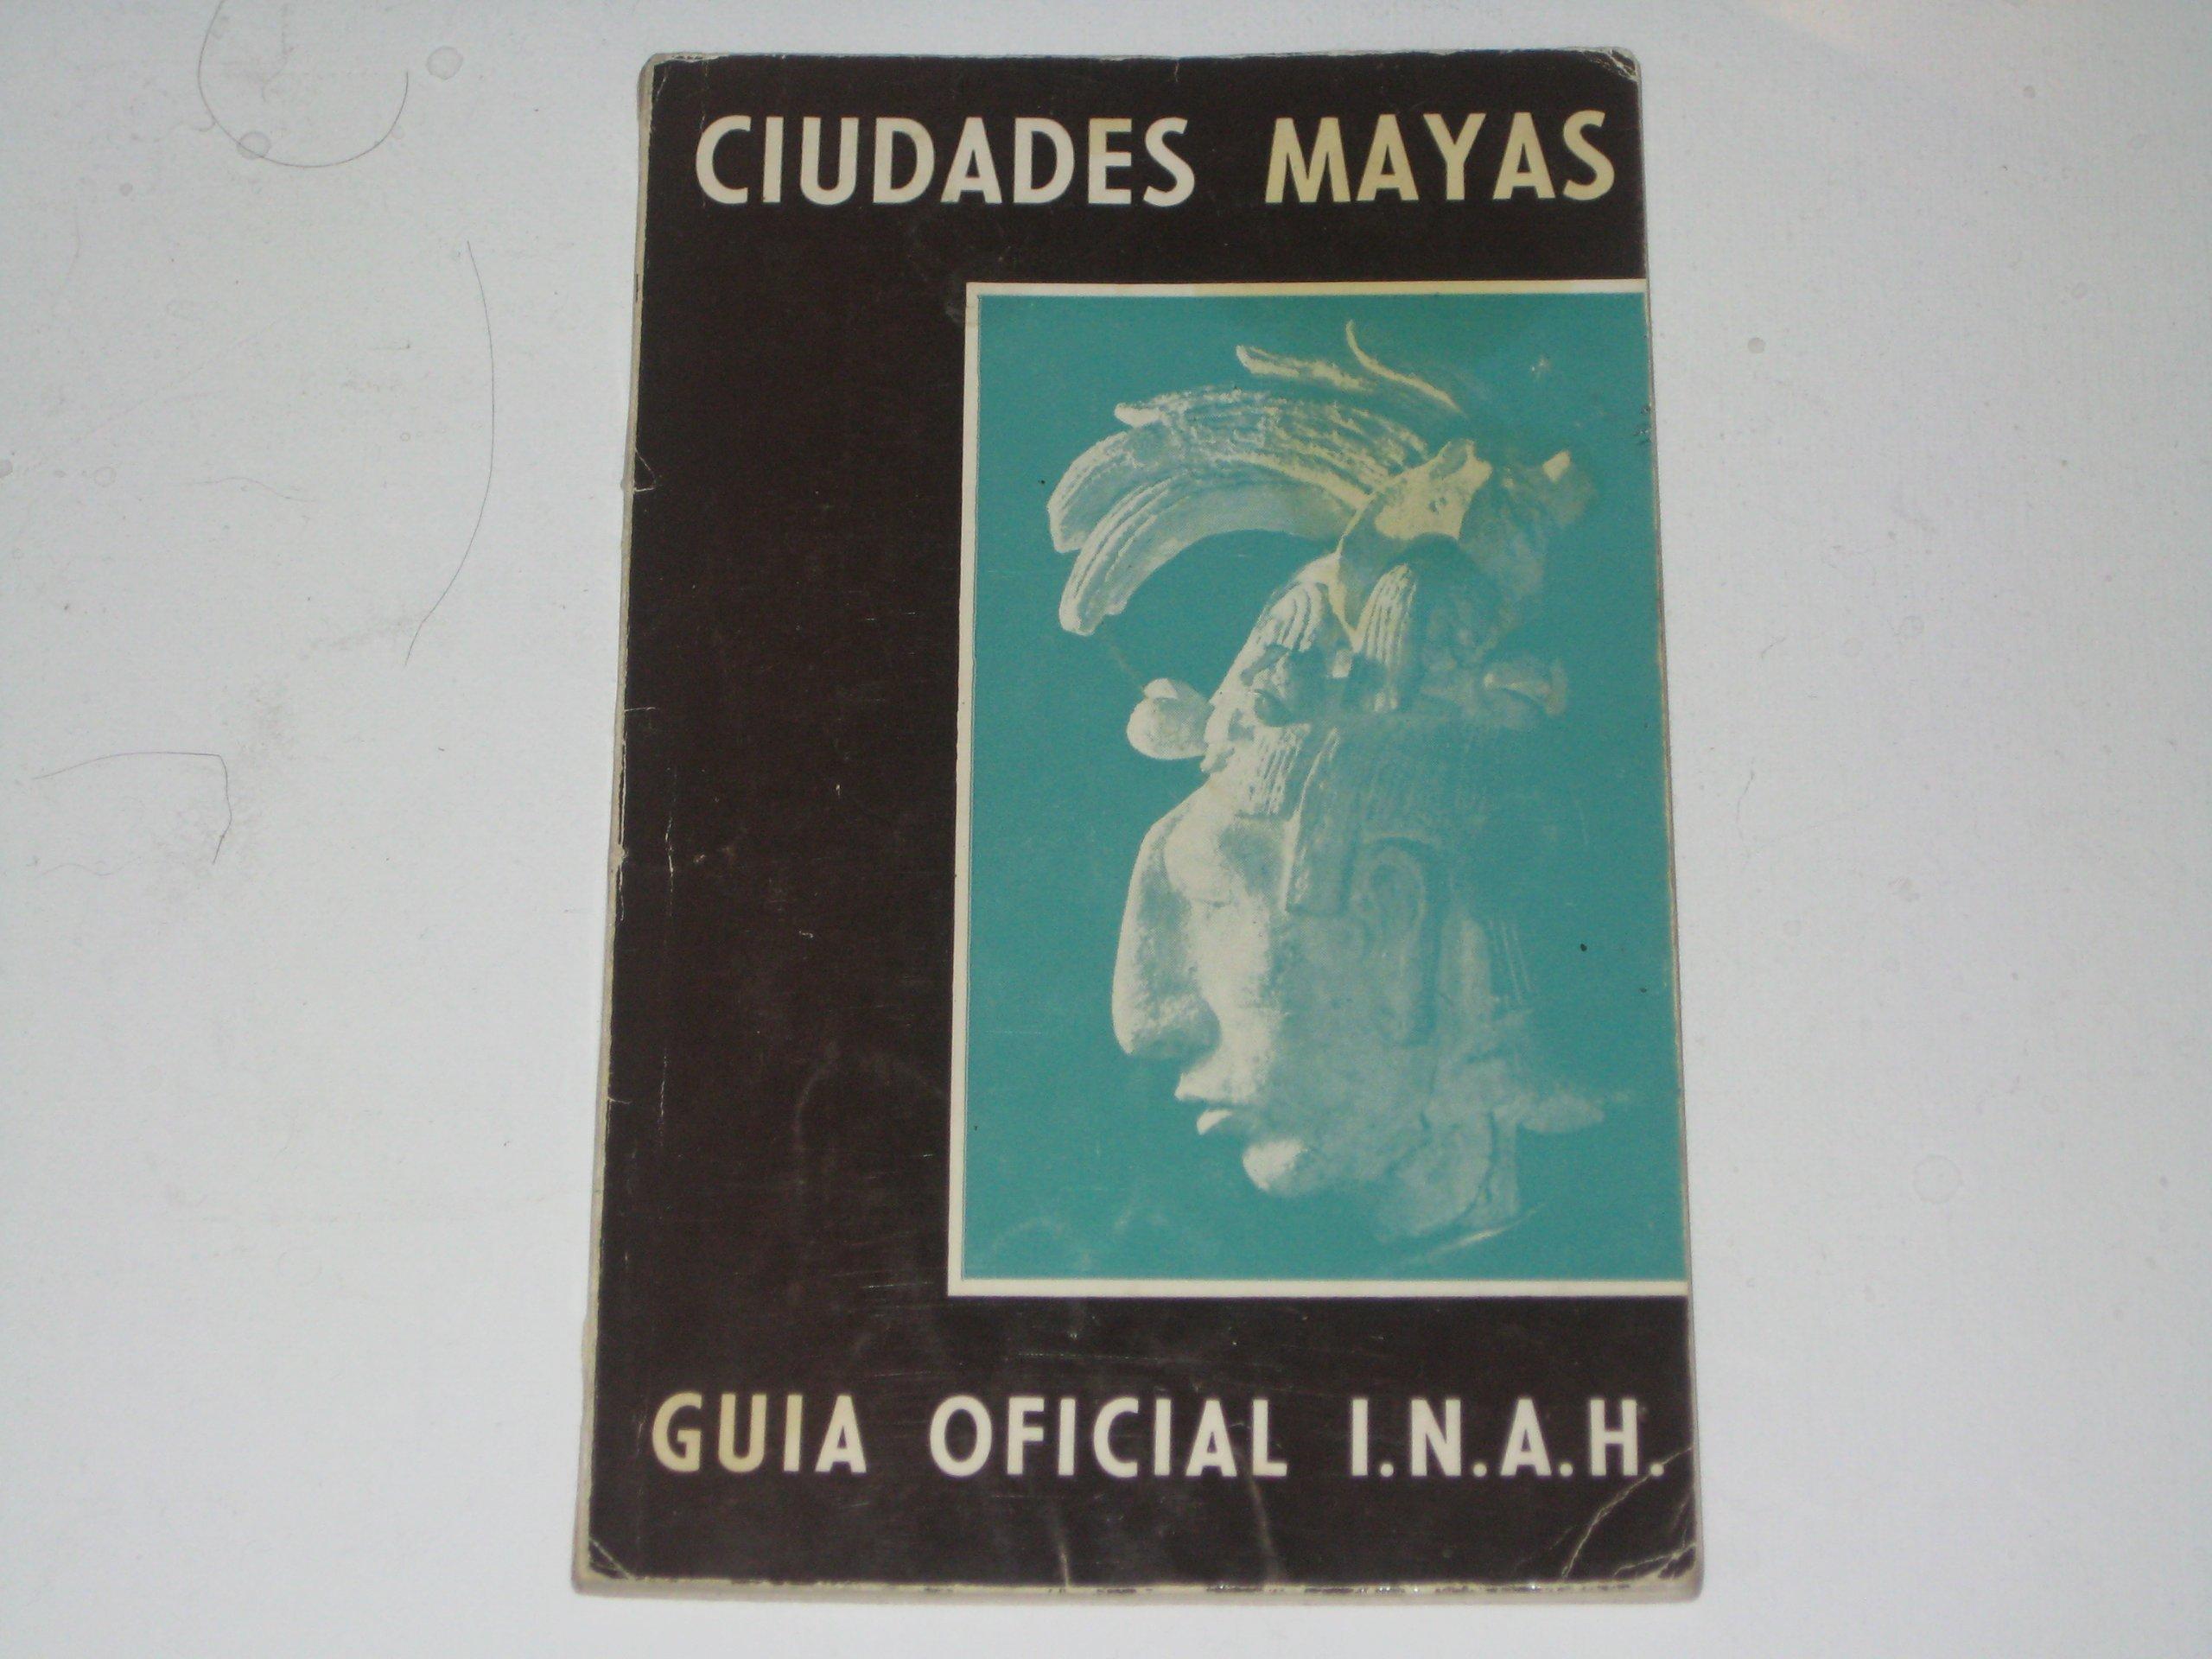 Ciudades Mayas: Guia Oficial I.N.A.H.